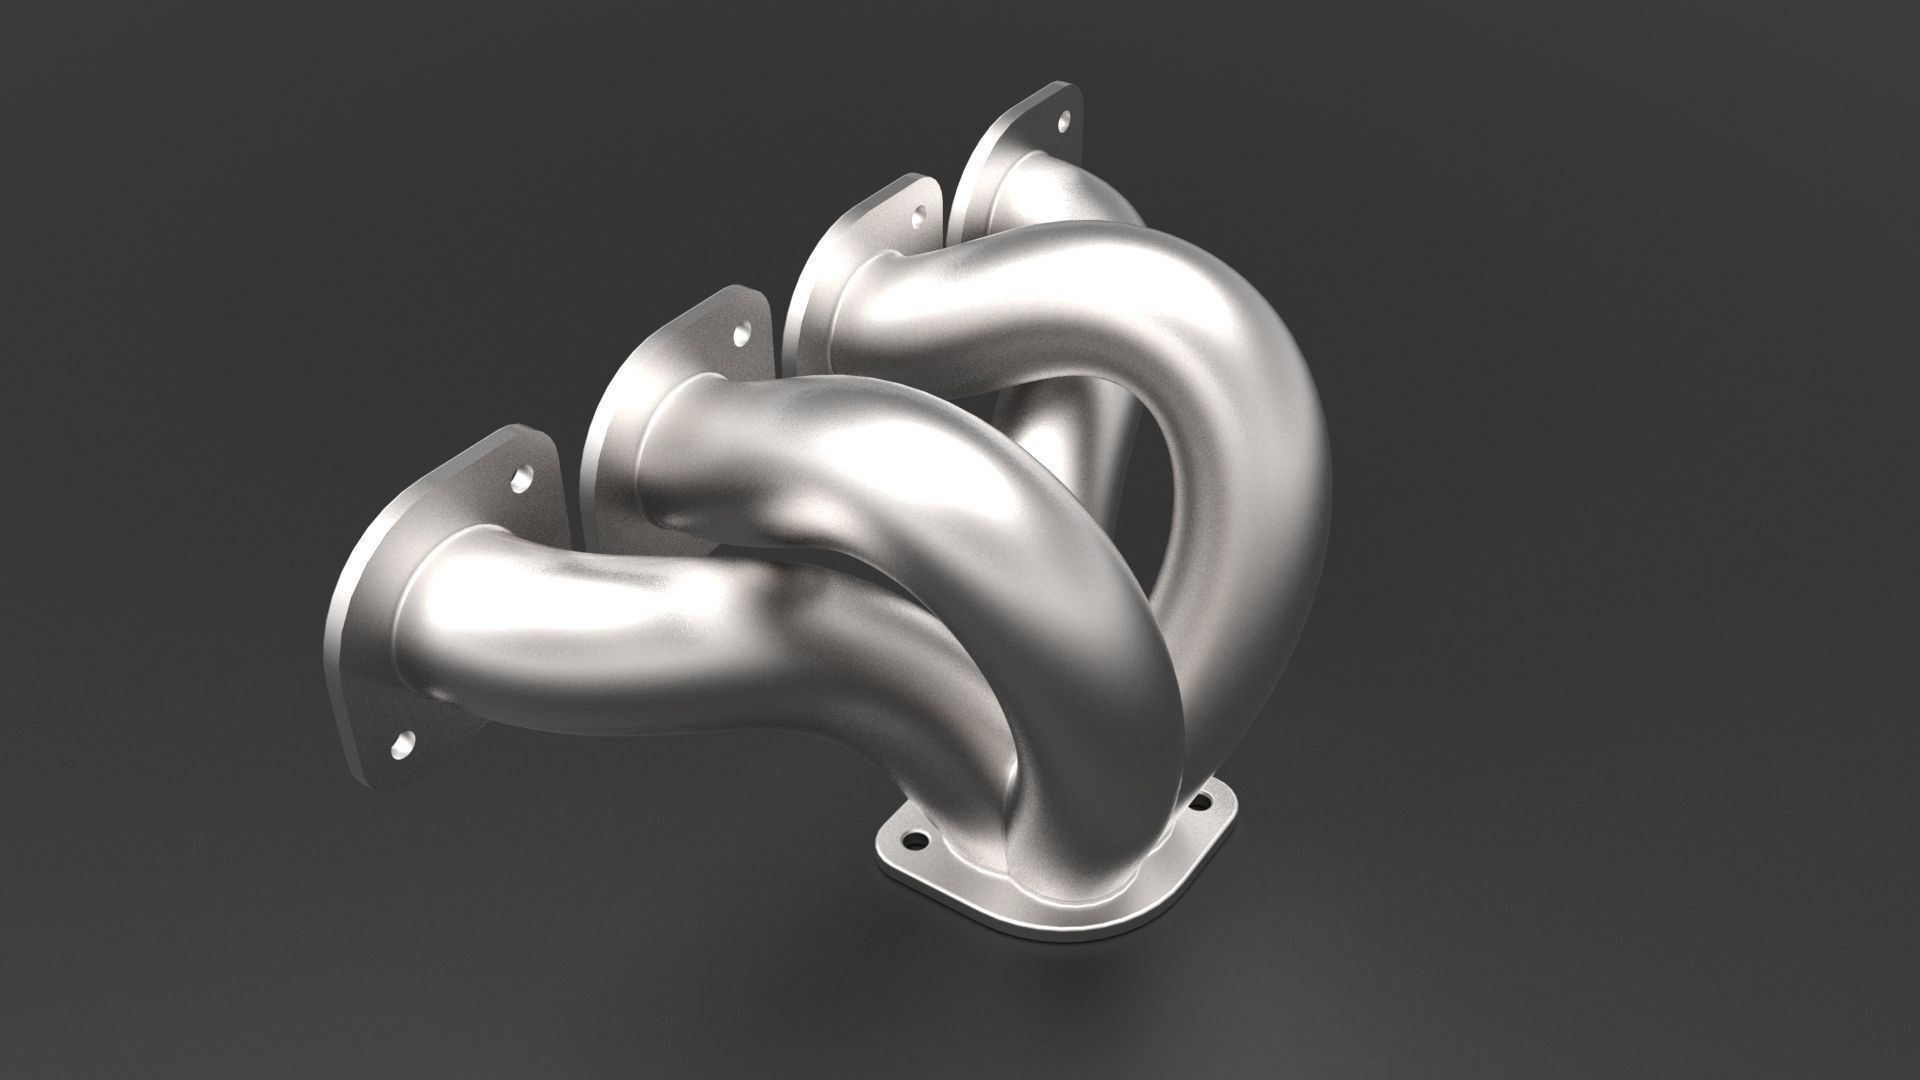 Turbo Exhaust Manifold